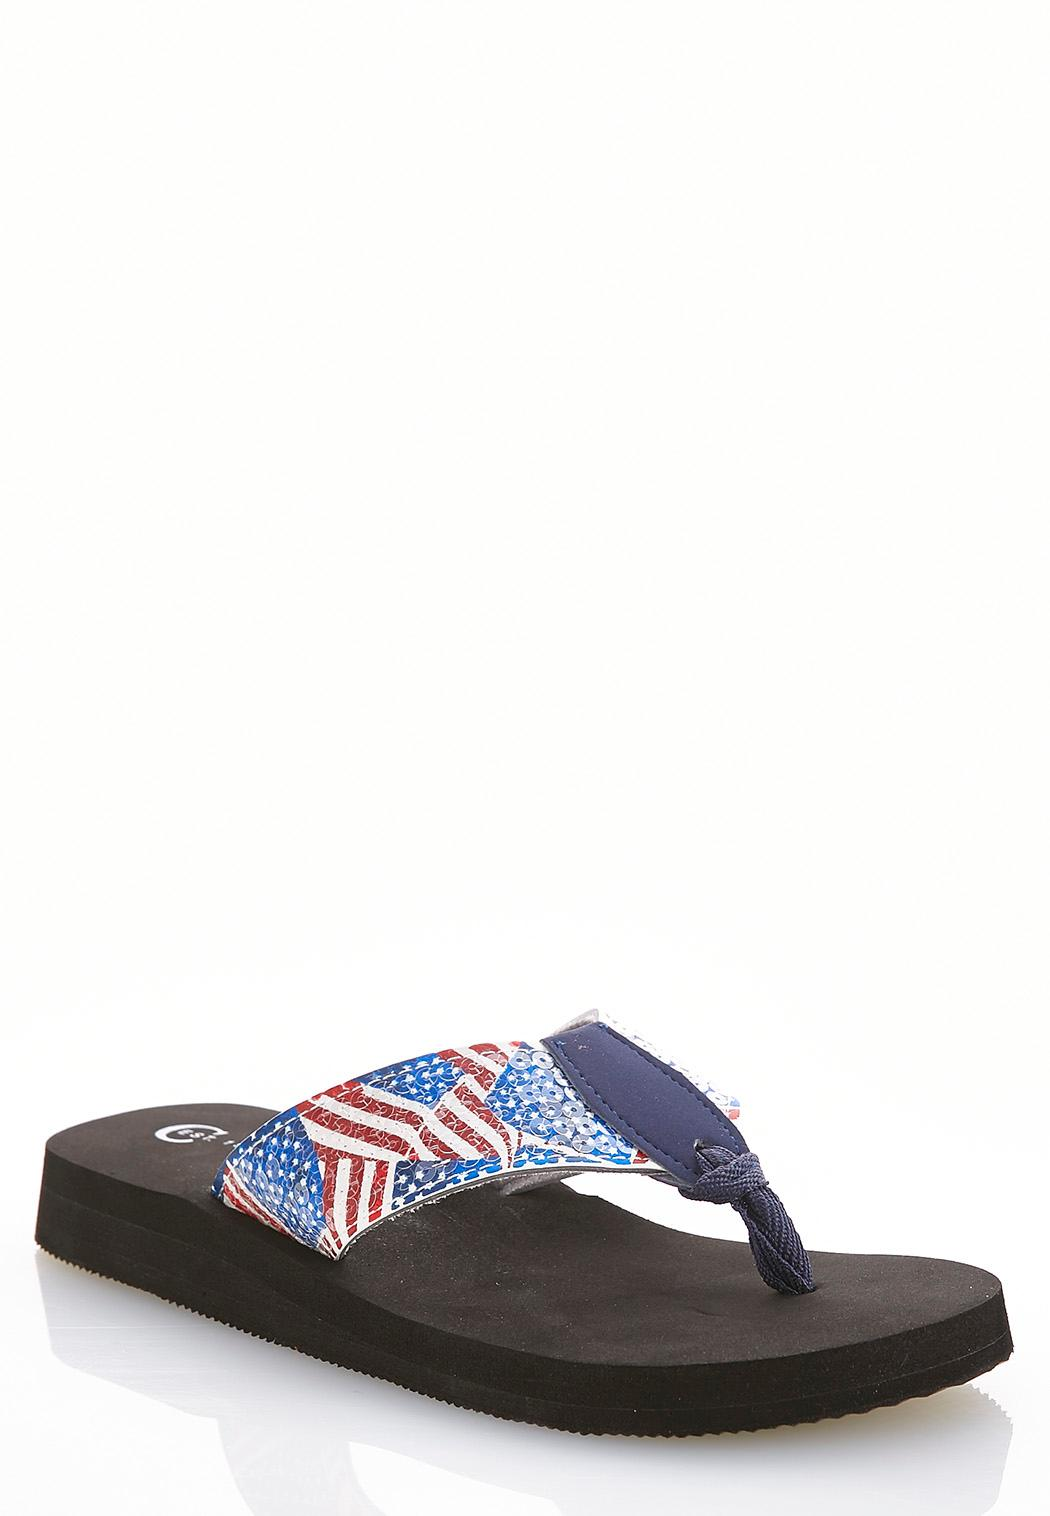 55ce64312 American Flag Sequin Flip Flops Flip Flops Cato Fashions